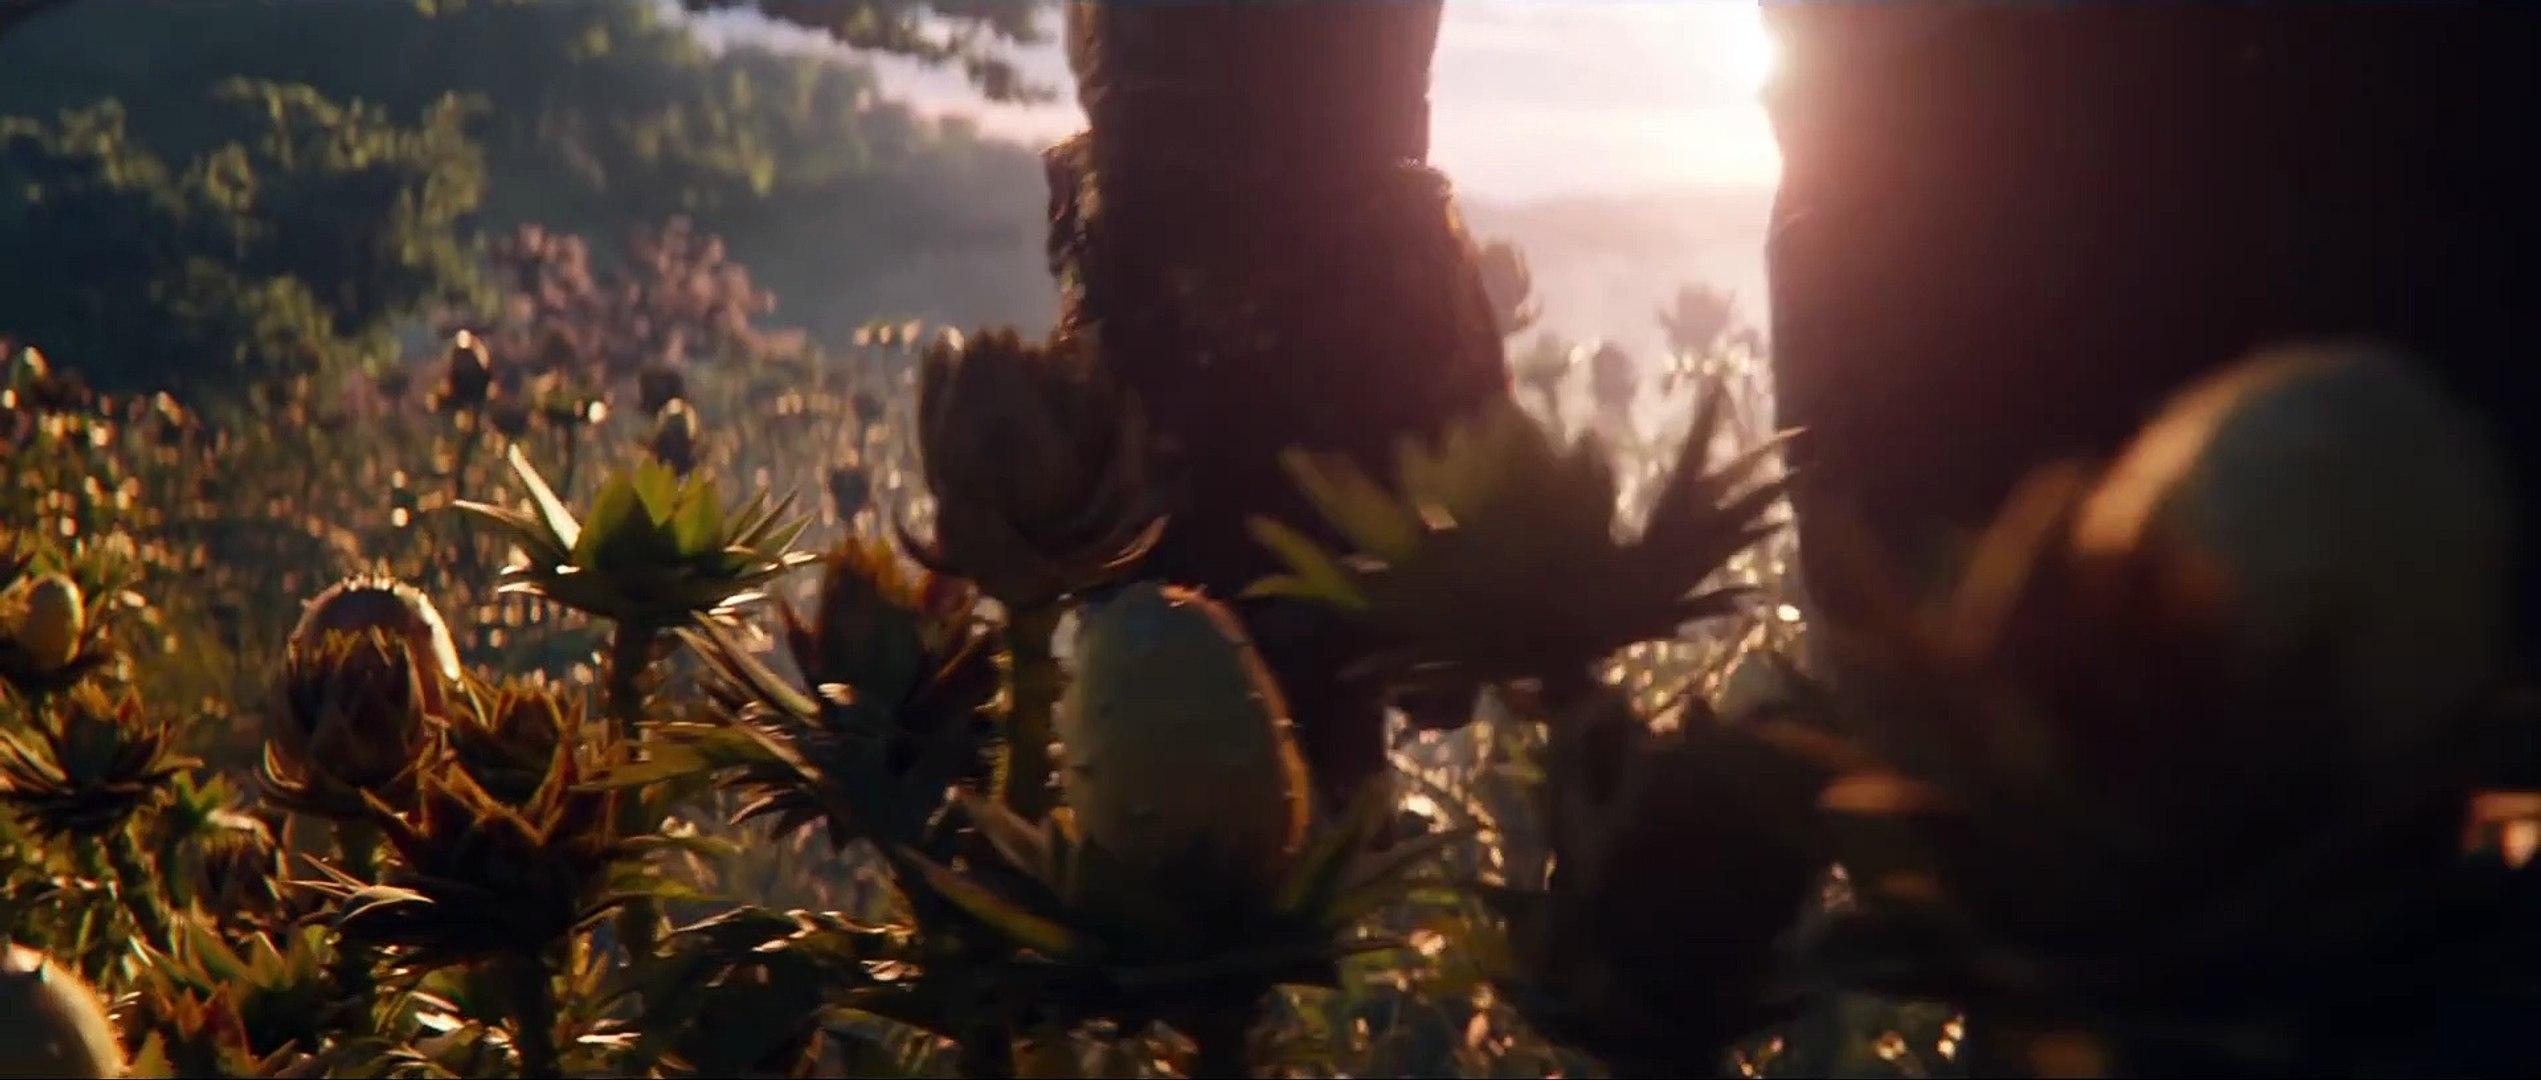 Trailer Avengers End Game